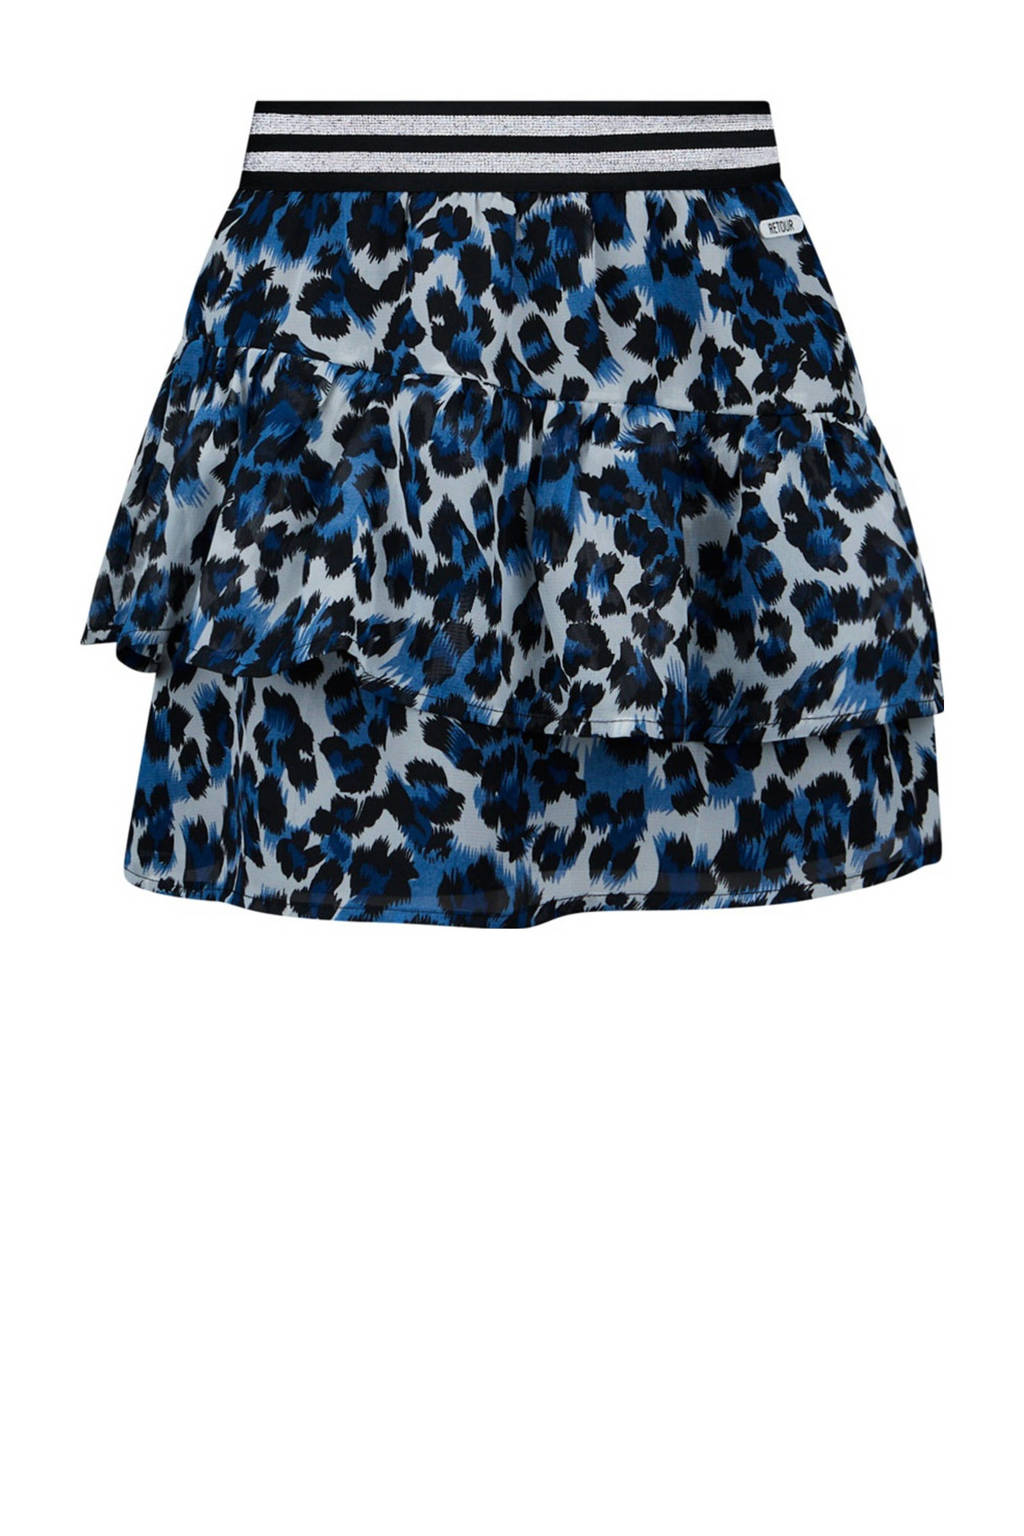 Retour Denim rok Provence met dierenprint en volant blauw/zwart, Blauw/zwart